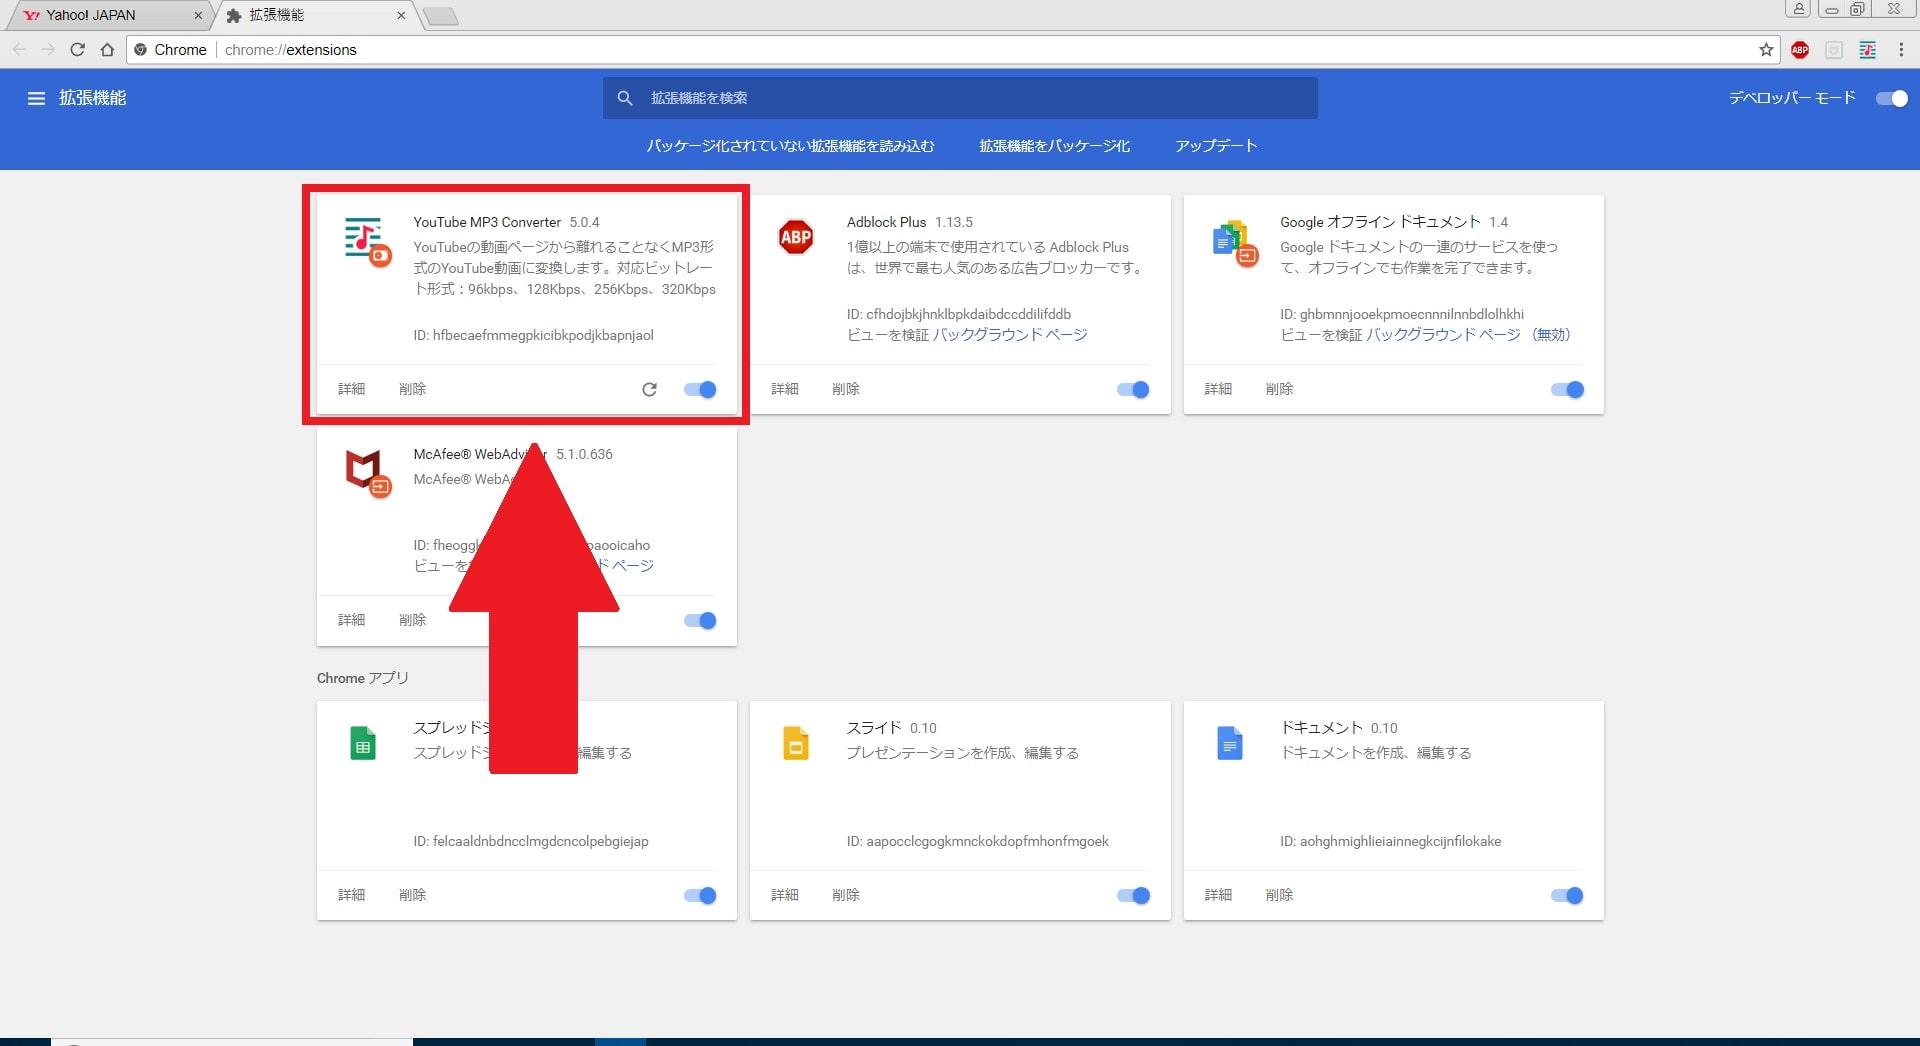 Google chromeの拡張機能の一覧画面で日本語化されたYoutube MP3 Converterの項目